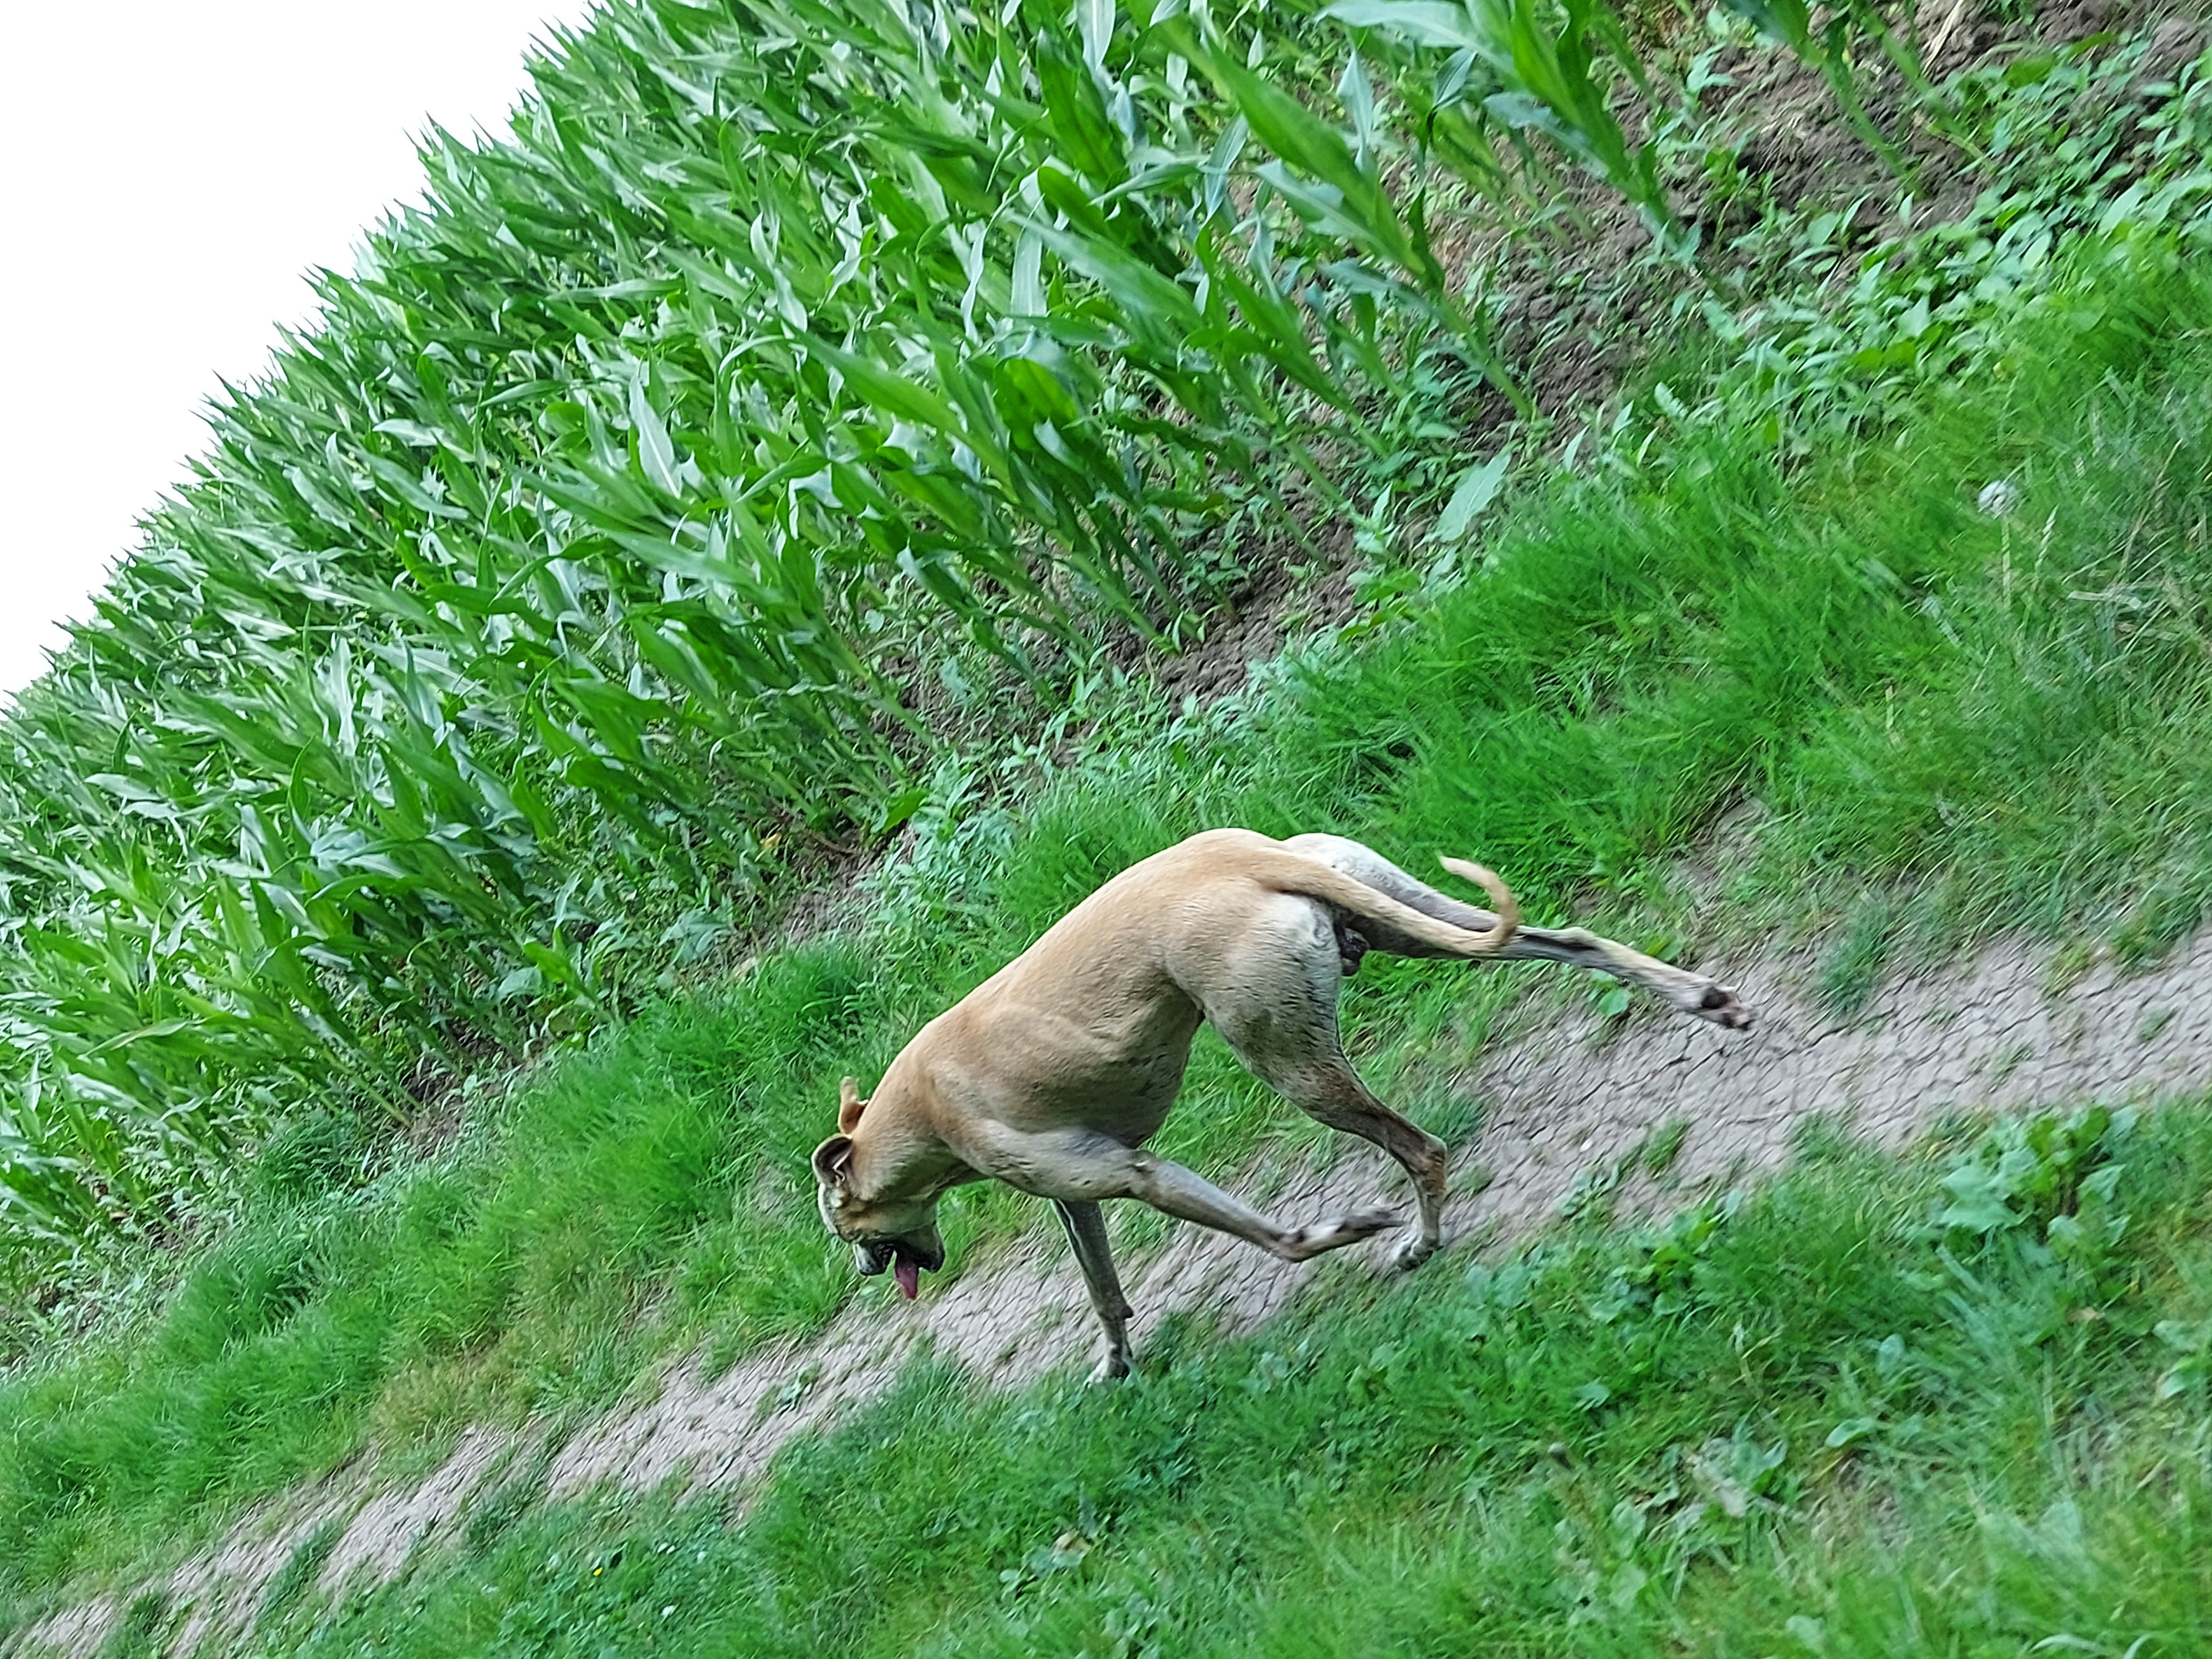 Bull greyhound